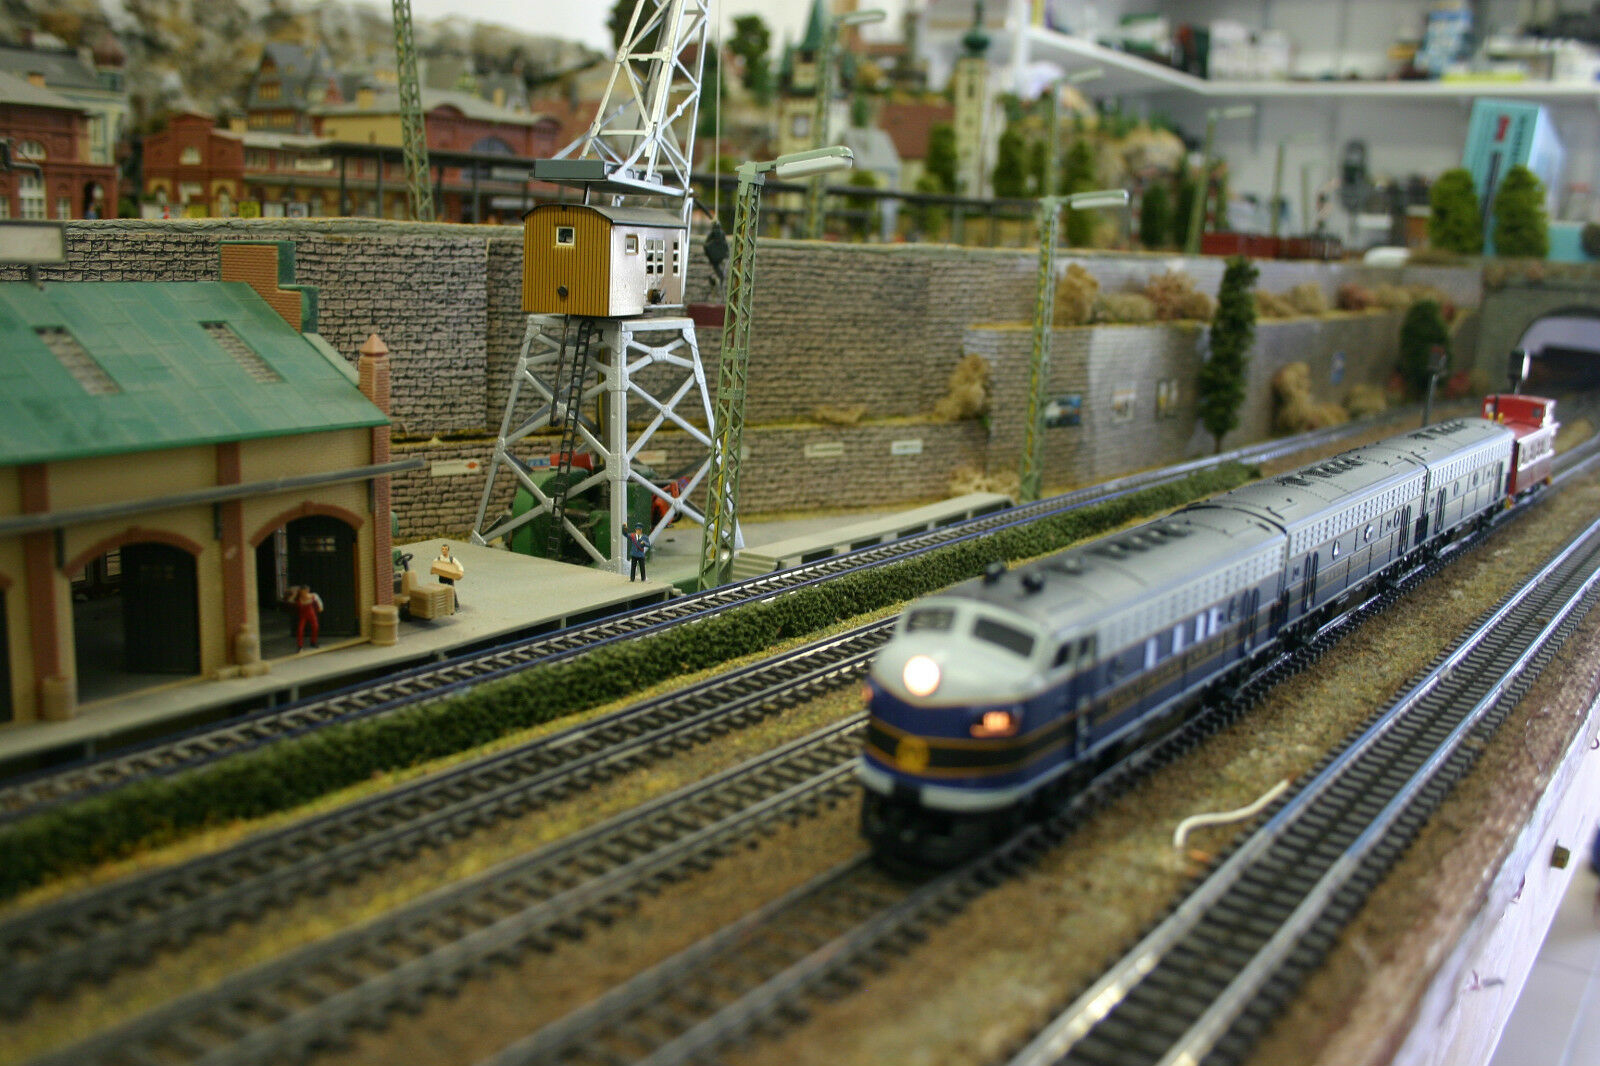 Train Locomotive Steam Electric